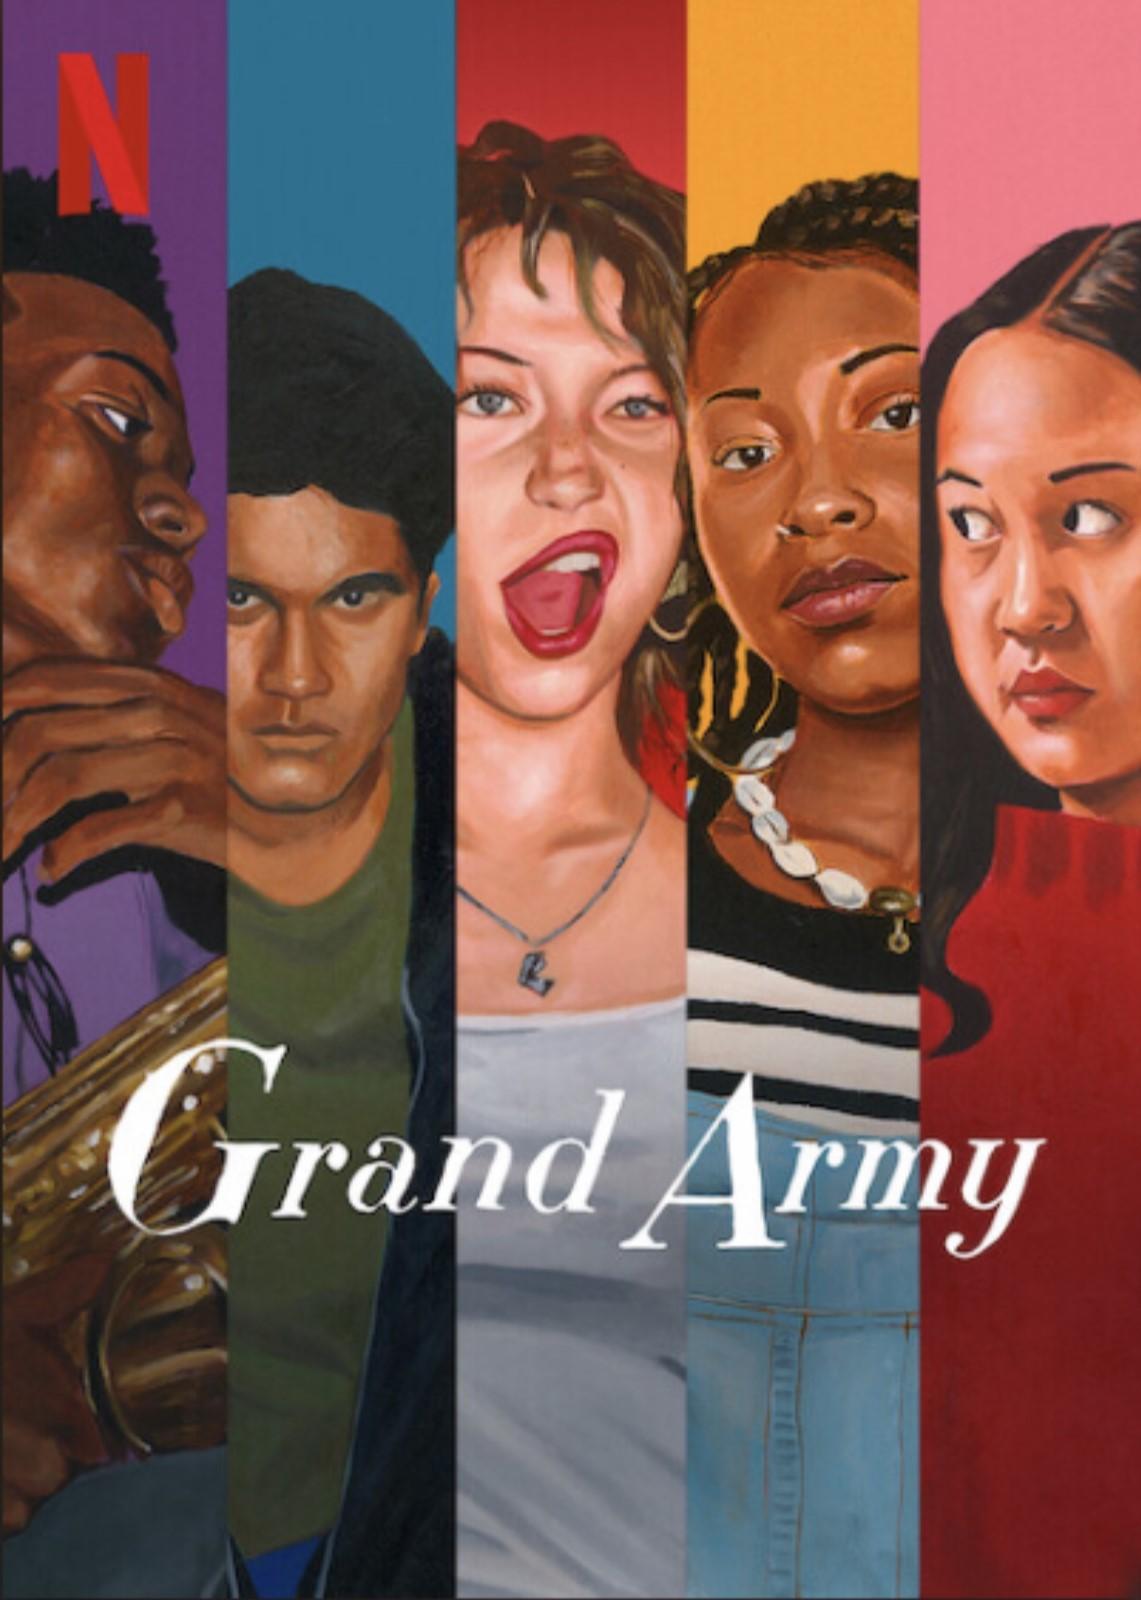 31 - Grand Army